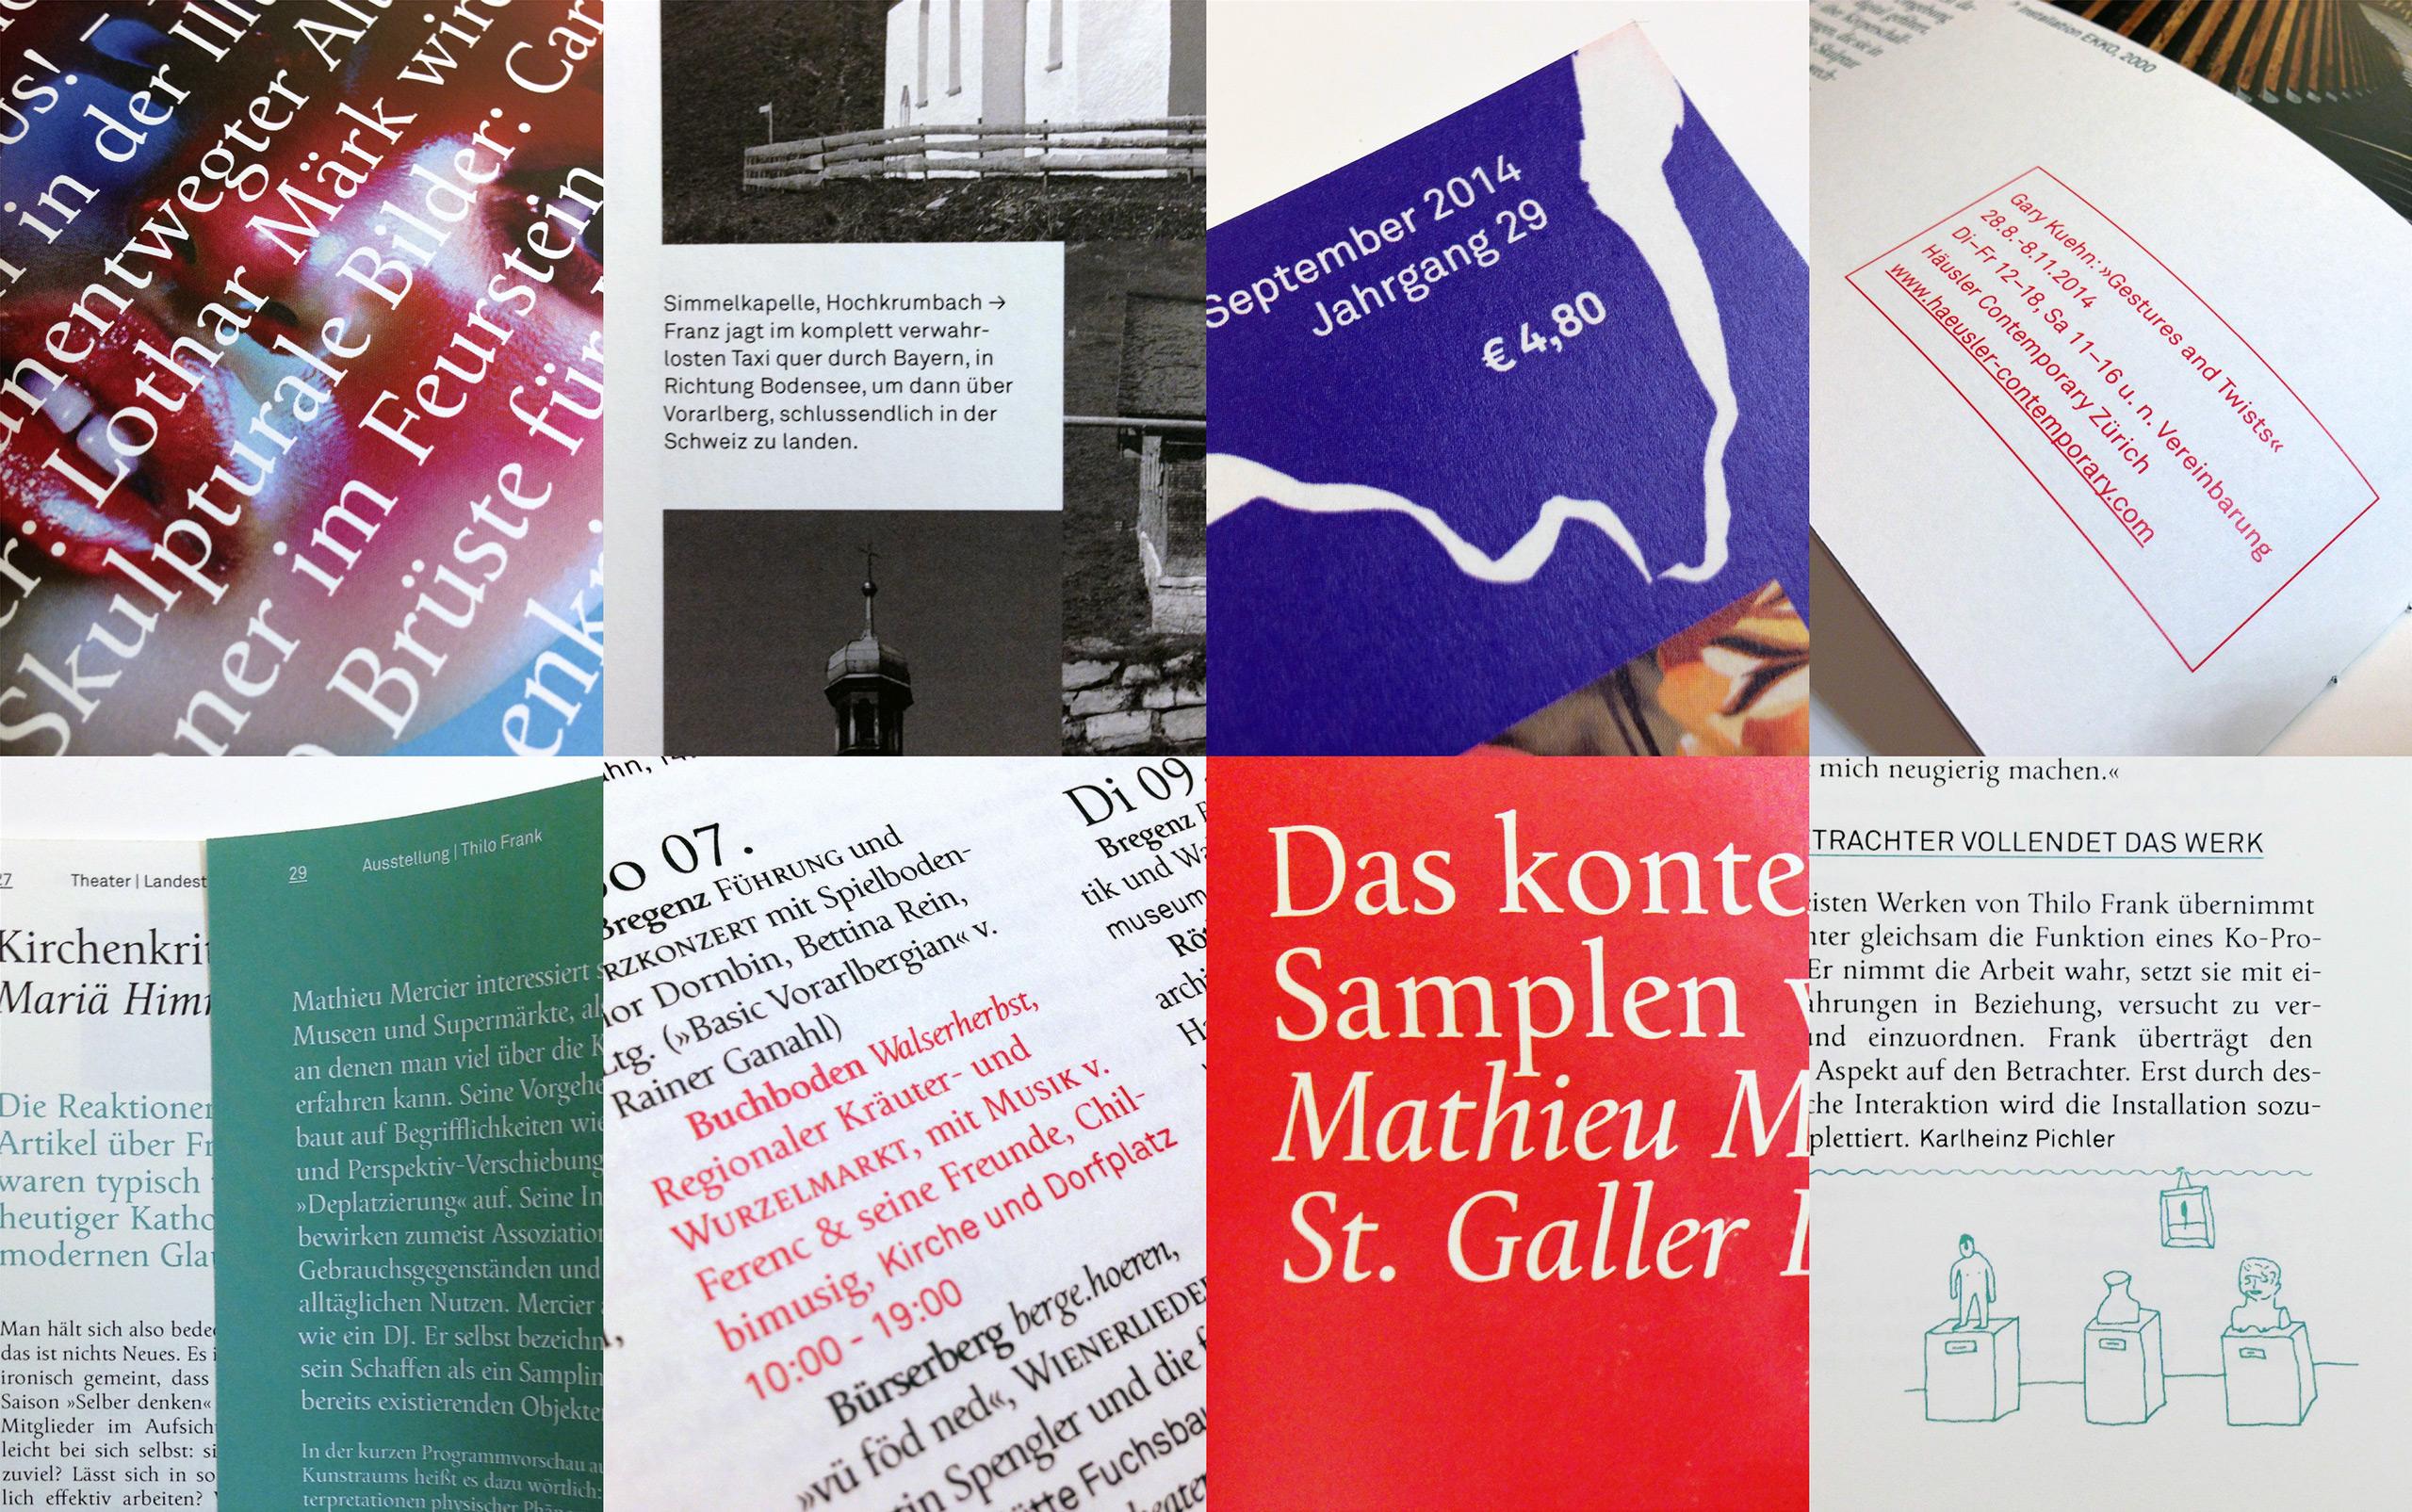 KULTUR_Zeitschrift_Redesign_Spitaler6